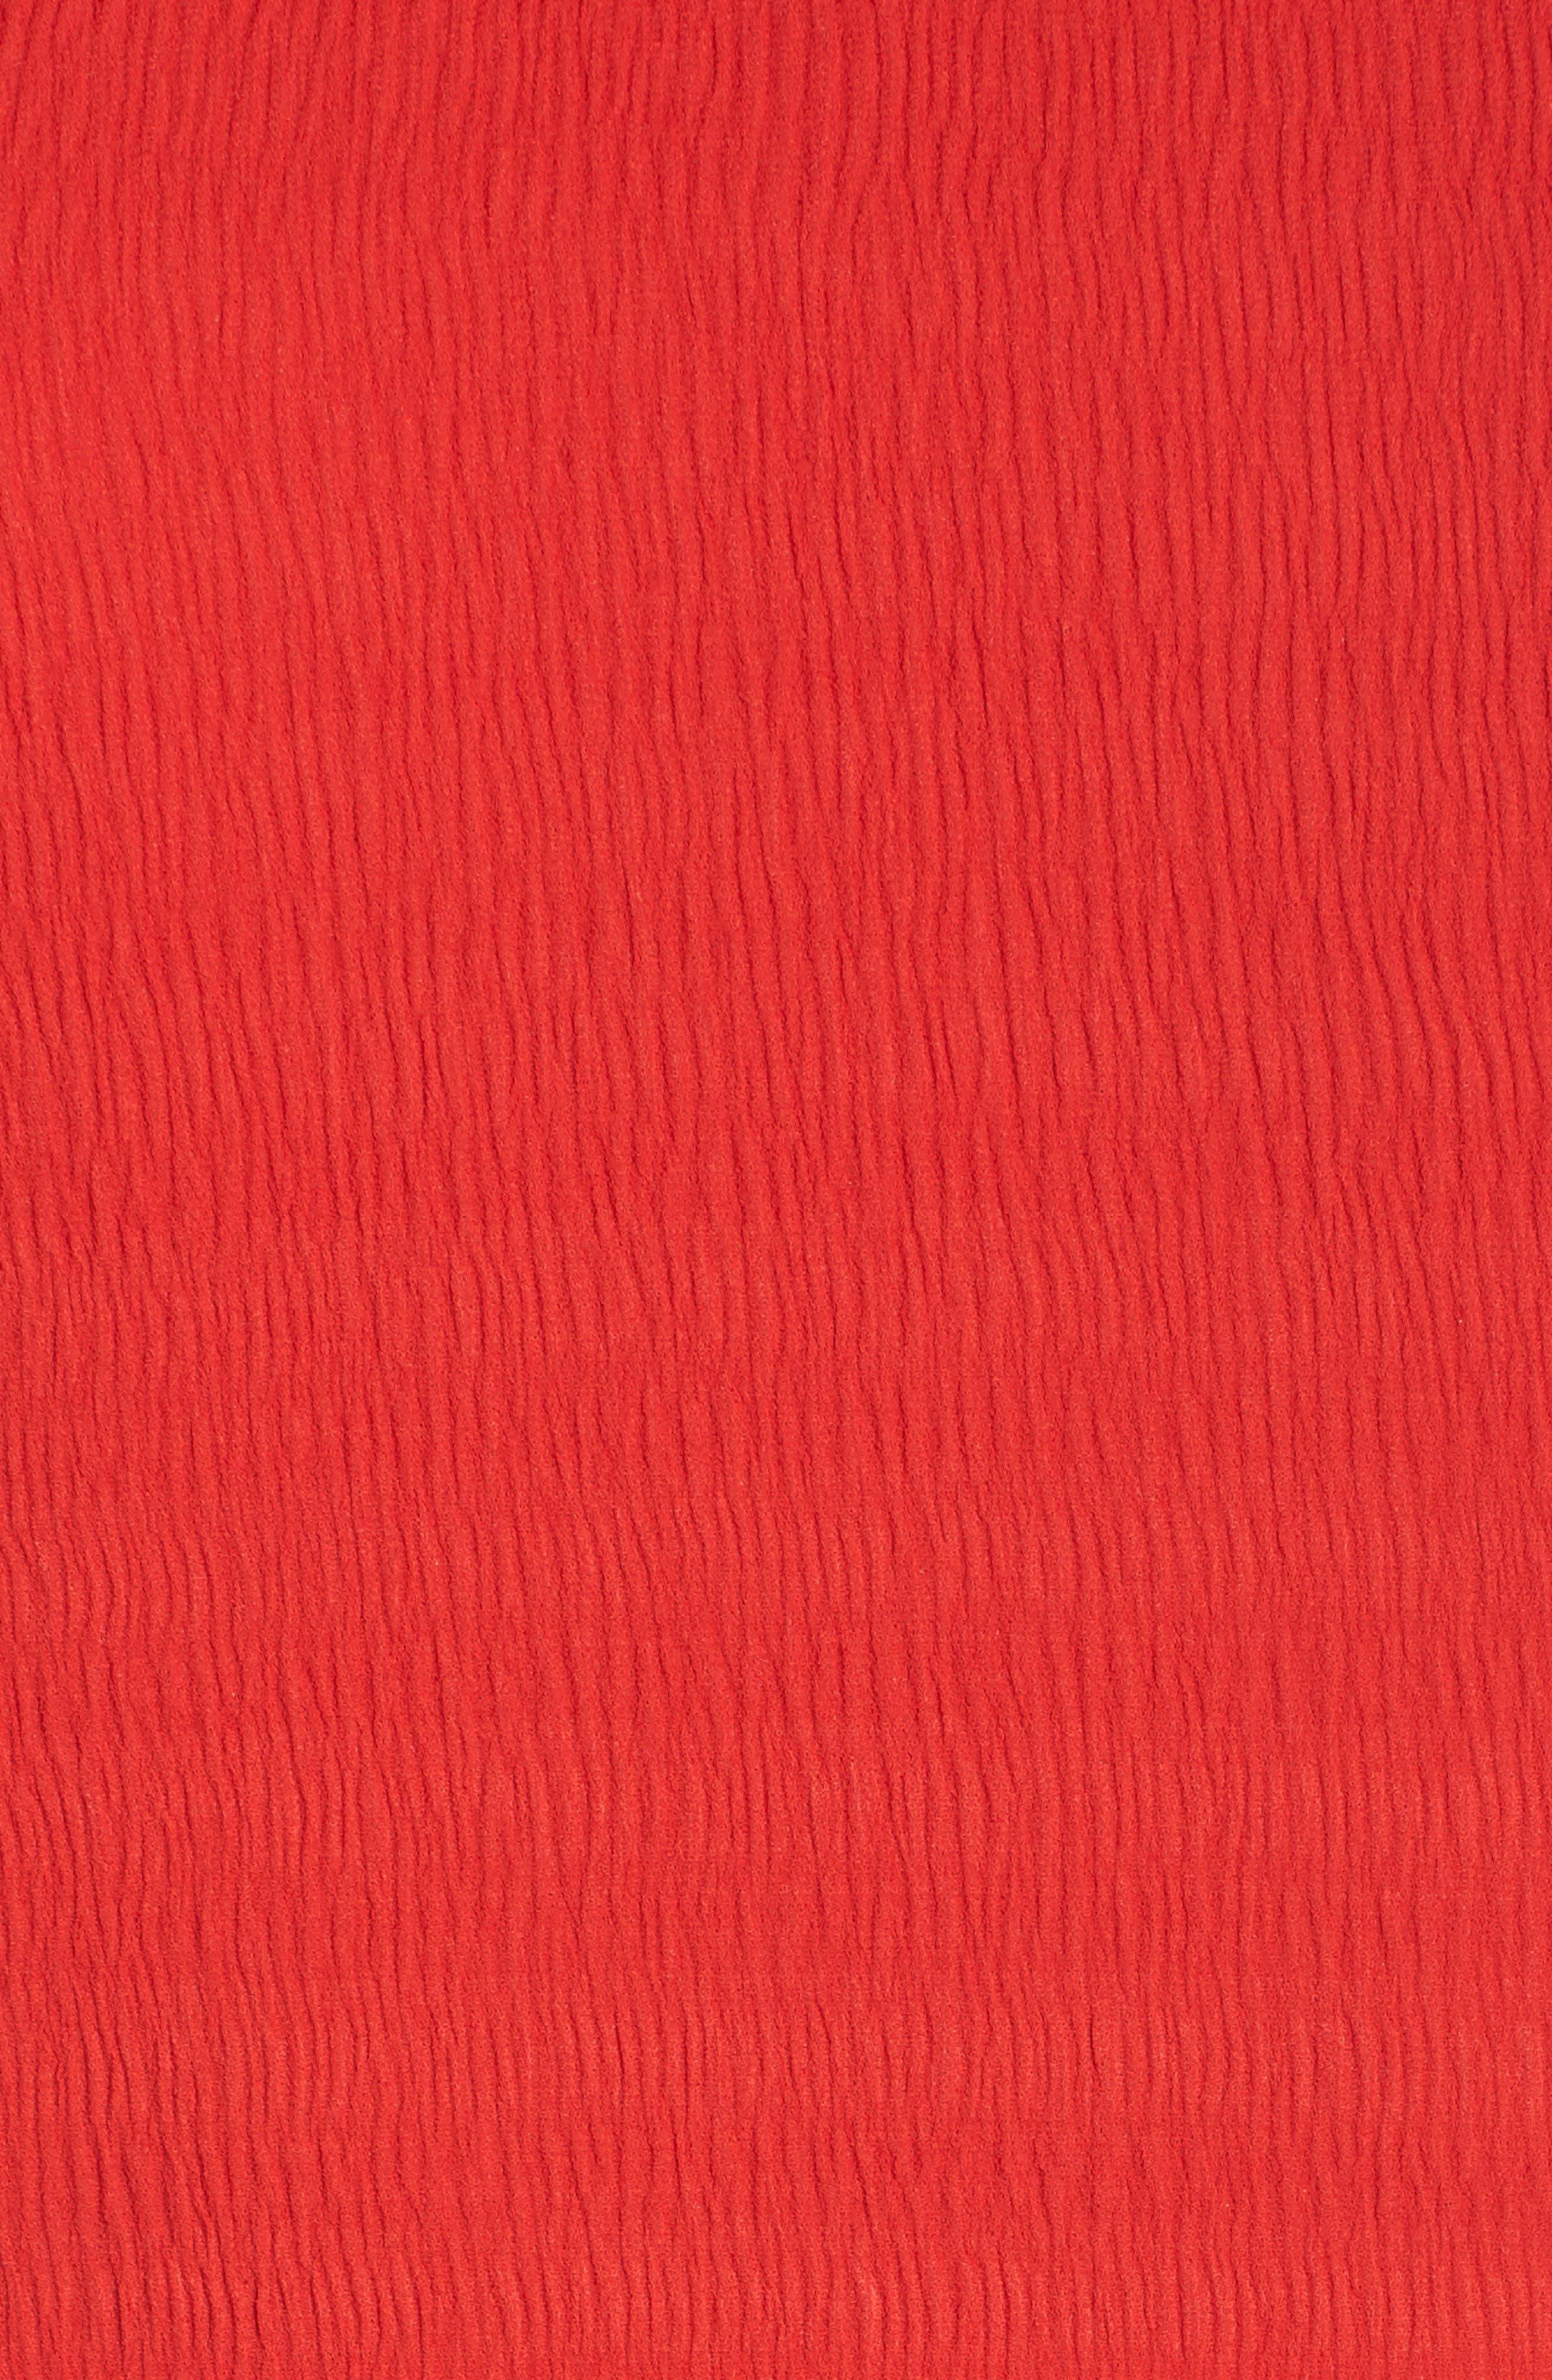 Ti Amo Ruched Halter Dress,                             Alternate thumbnail 6, color,                             620